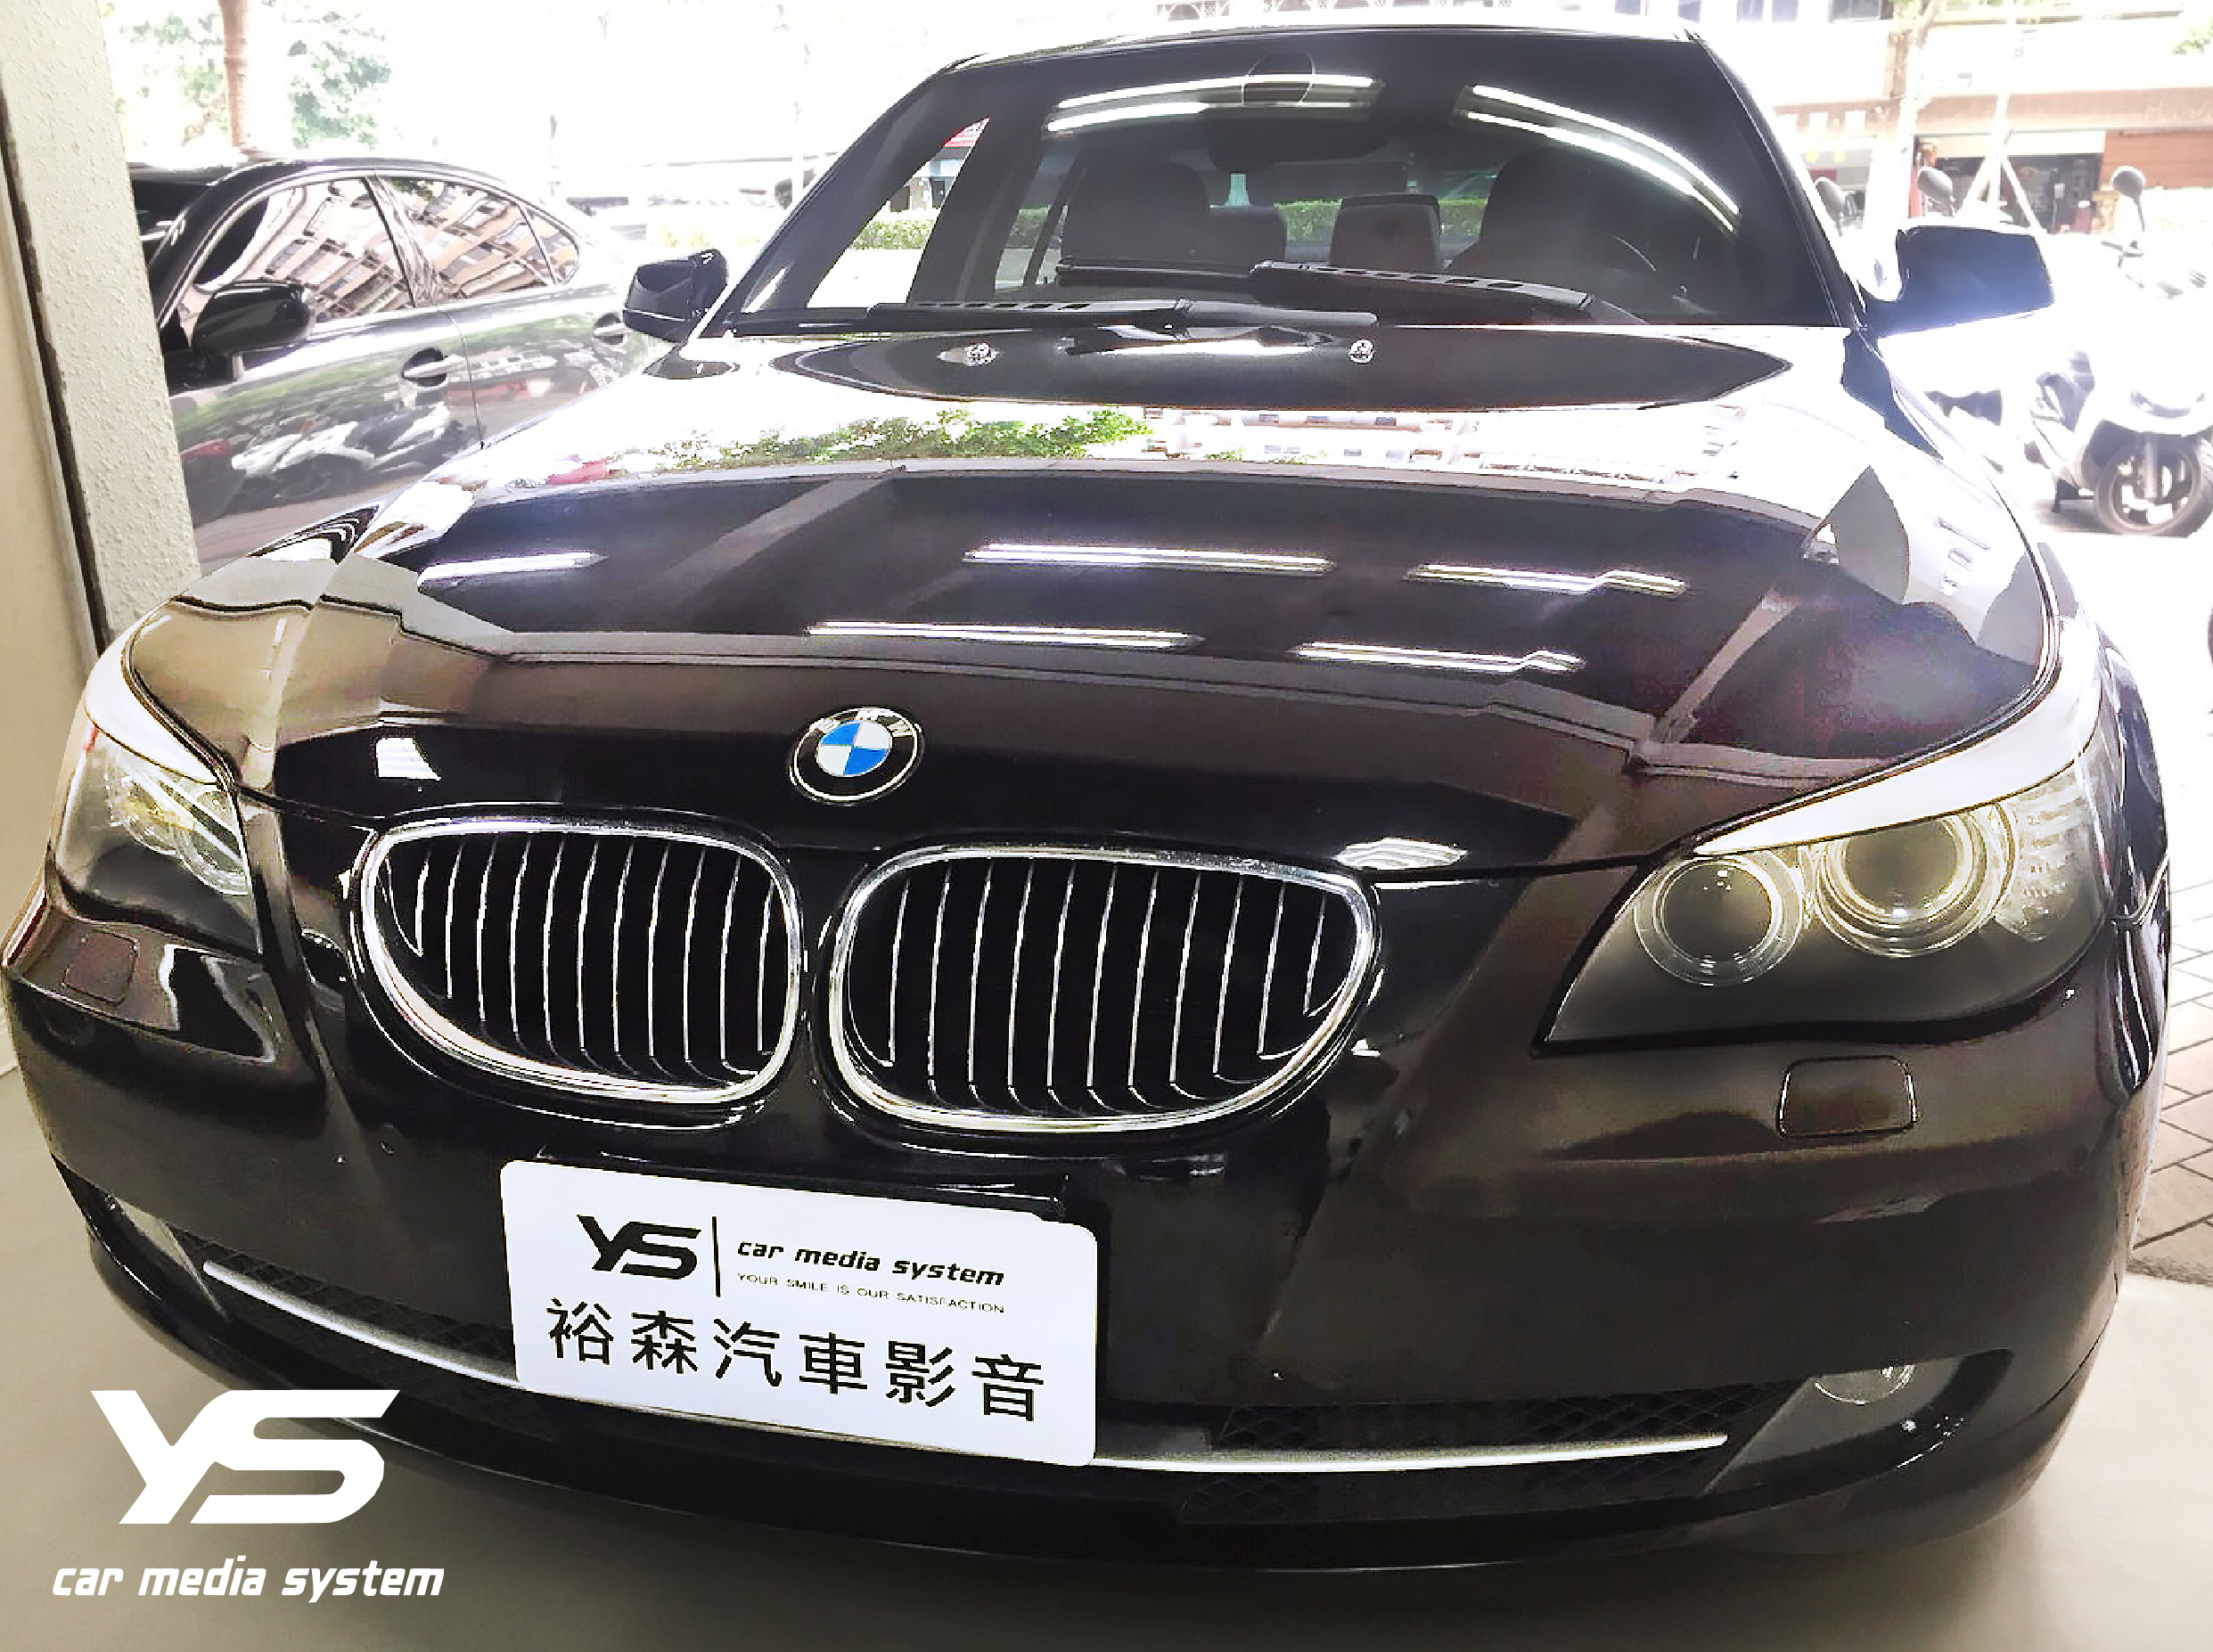 寶馬 BMW E60 (523i)